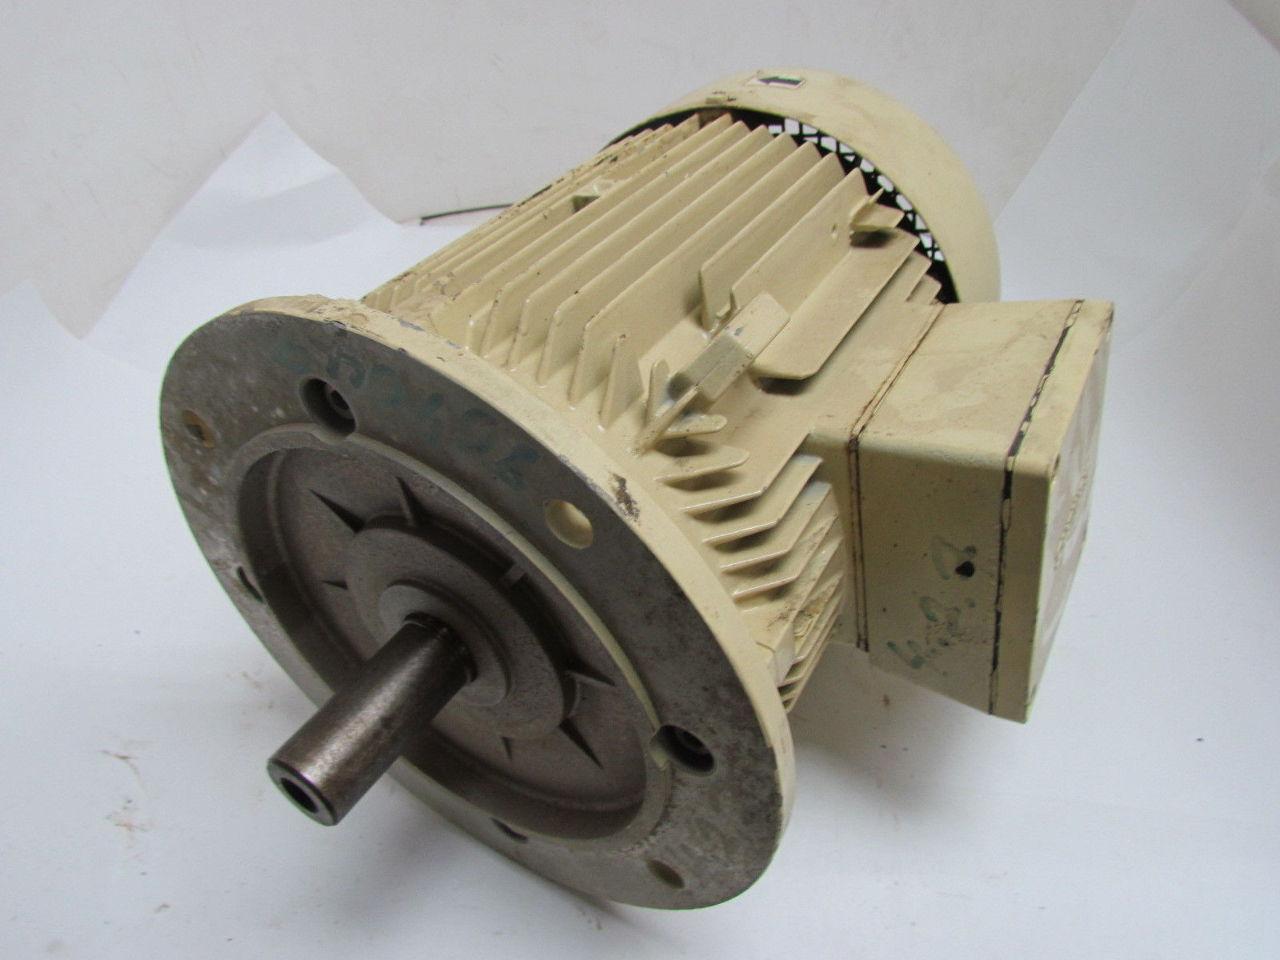 Siemens 1 La5113 2aa11 4 6 Kw 3 Ph 230 400 V Electric: 1 kw electric motor